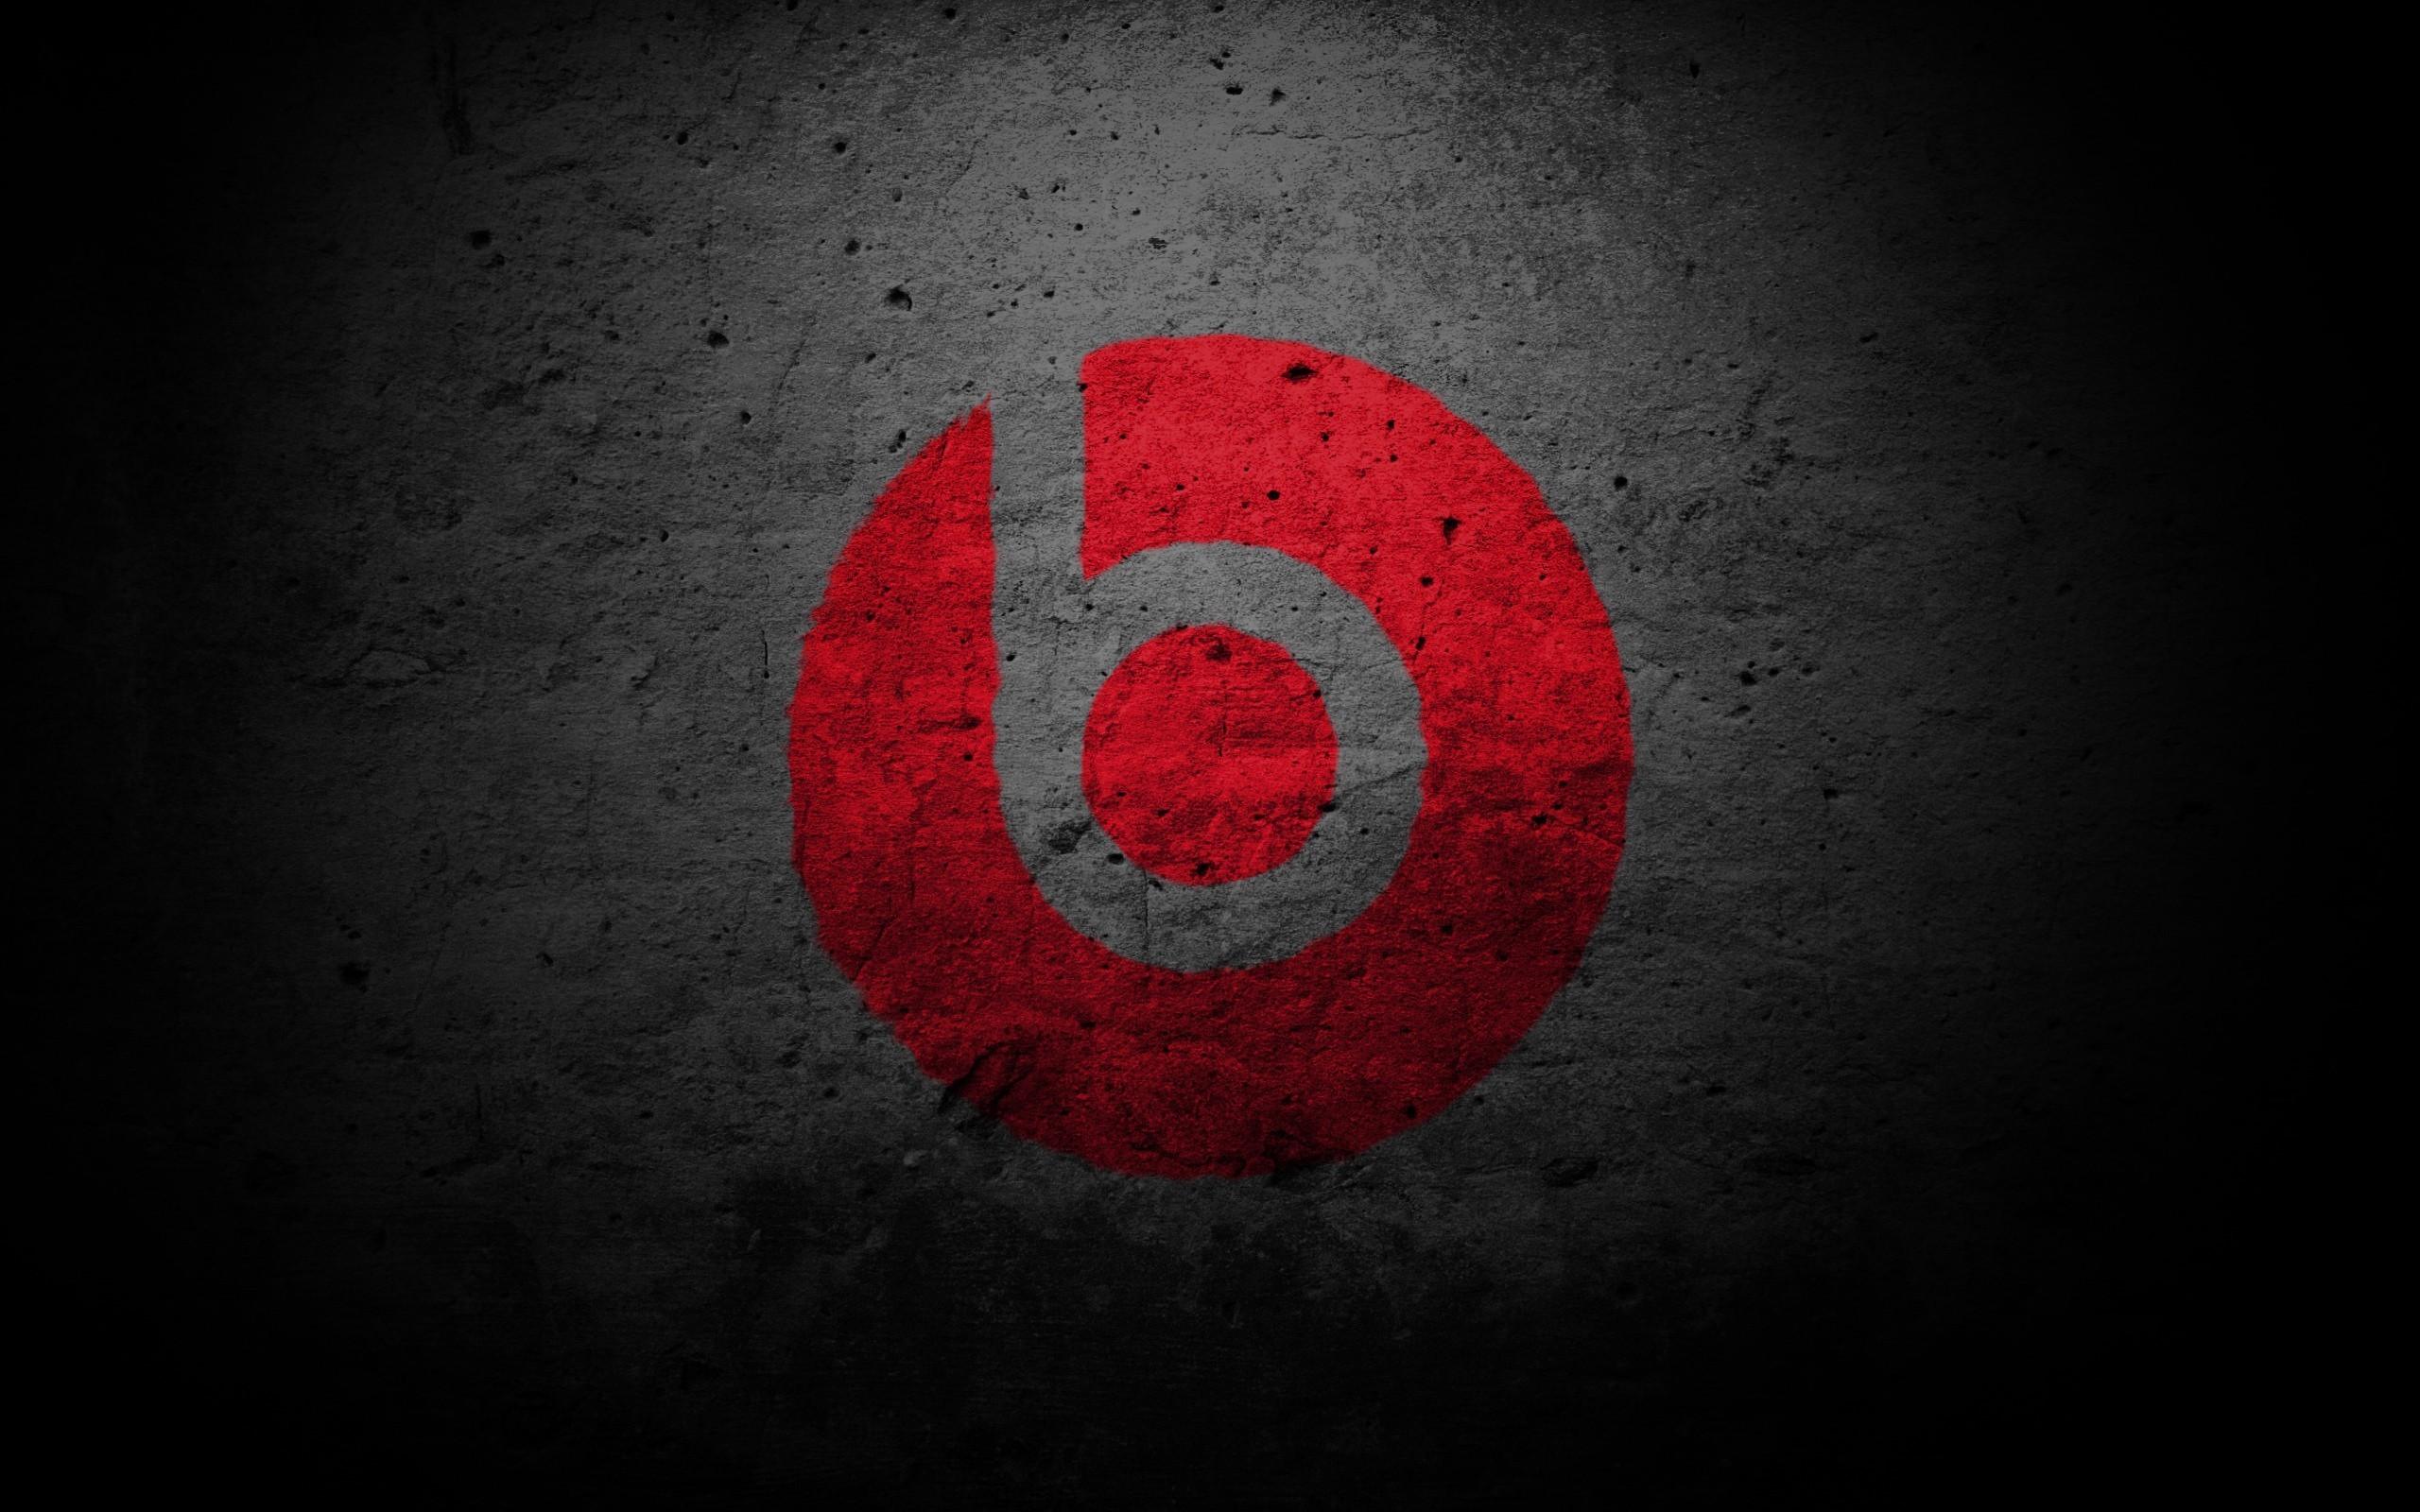 Beats by Dre Wallpaper ·① WallpaperTag